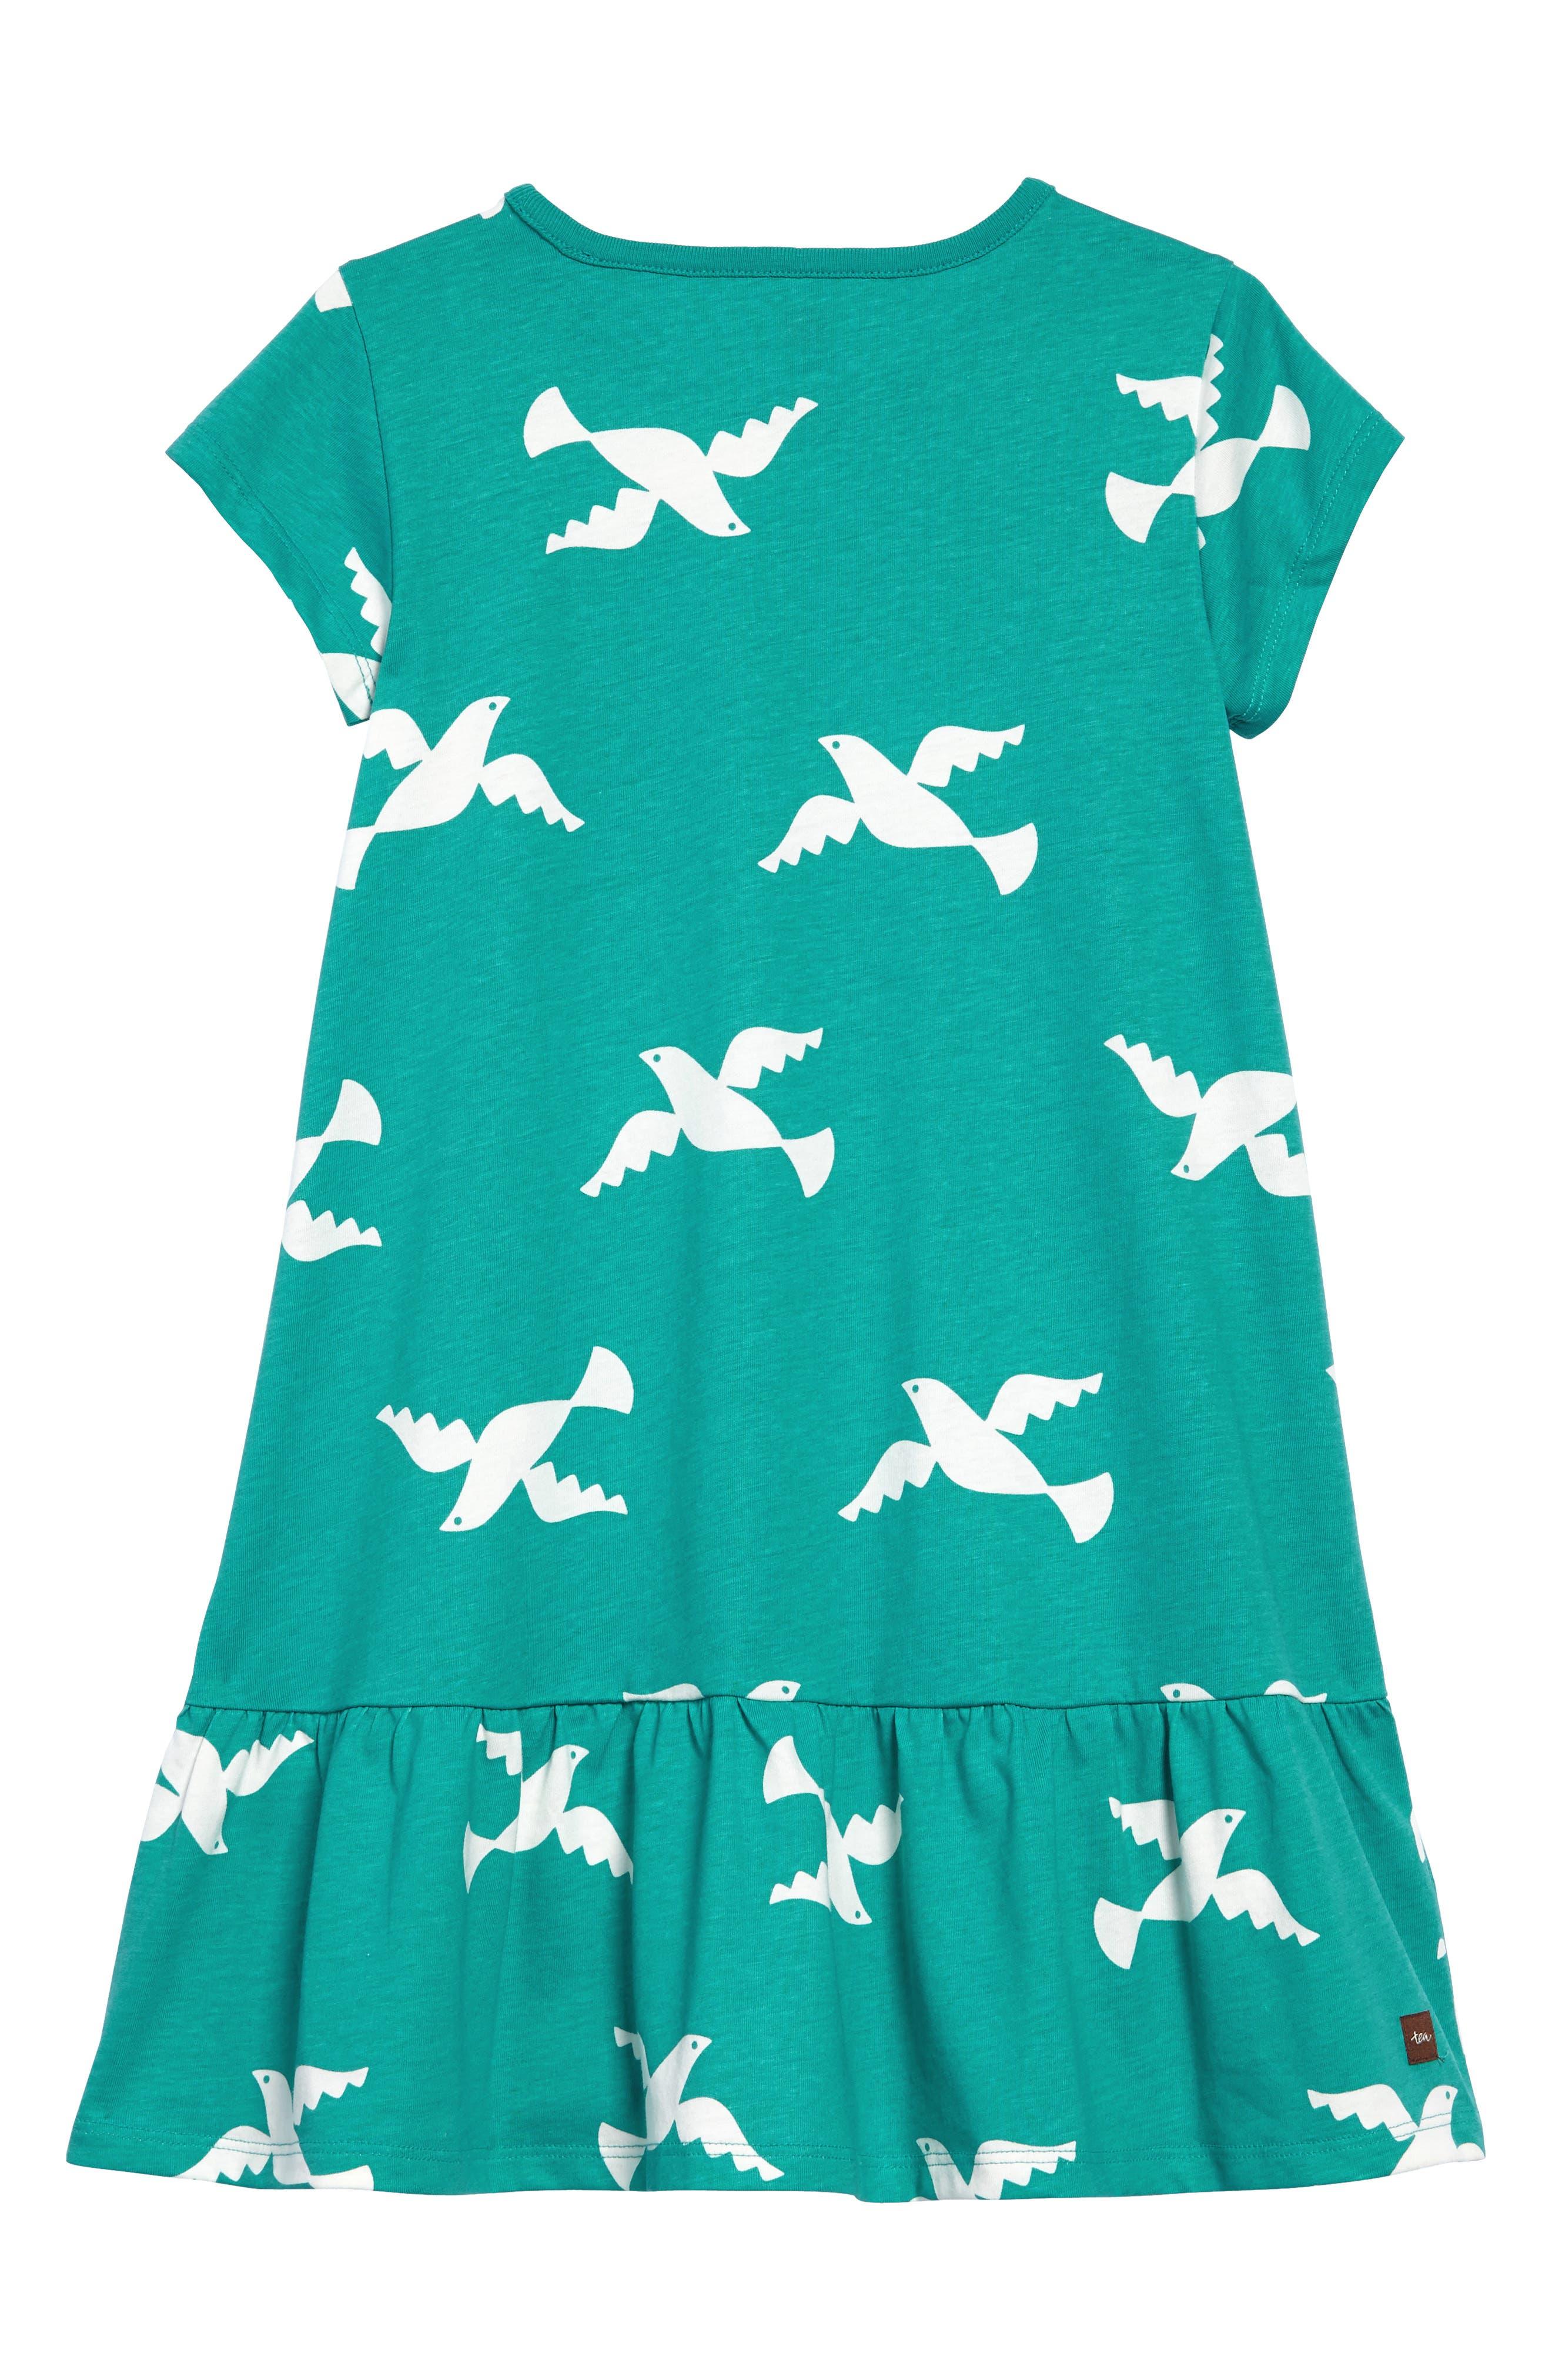 Birds in Flight Ruffle Dress,                             Alternate thumbnail 2, color,                             401